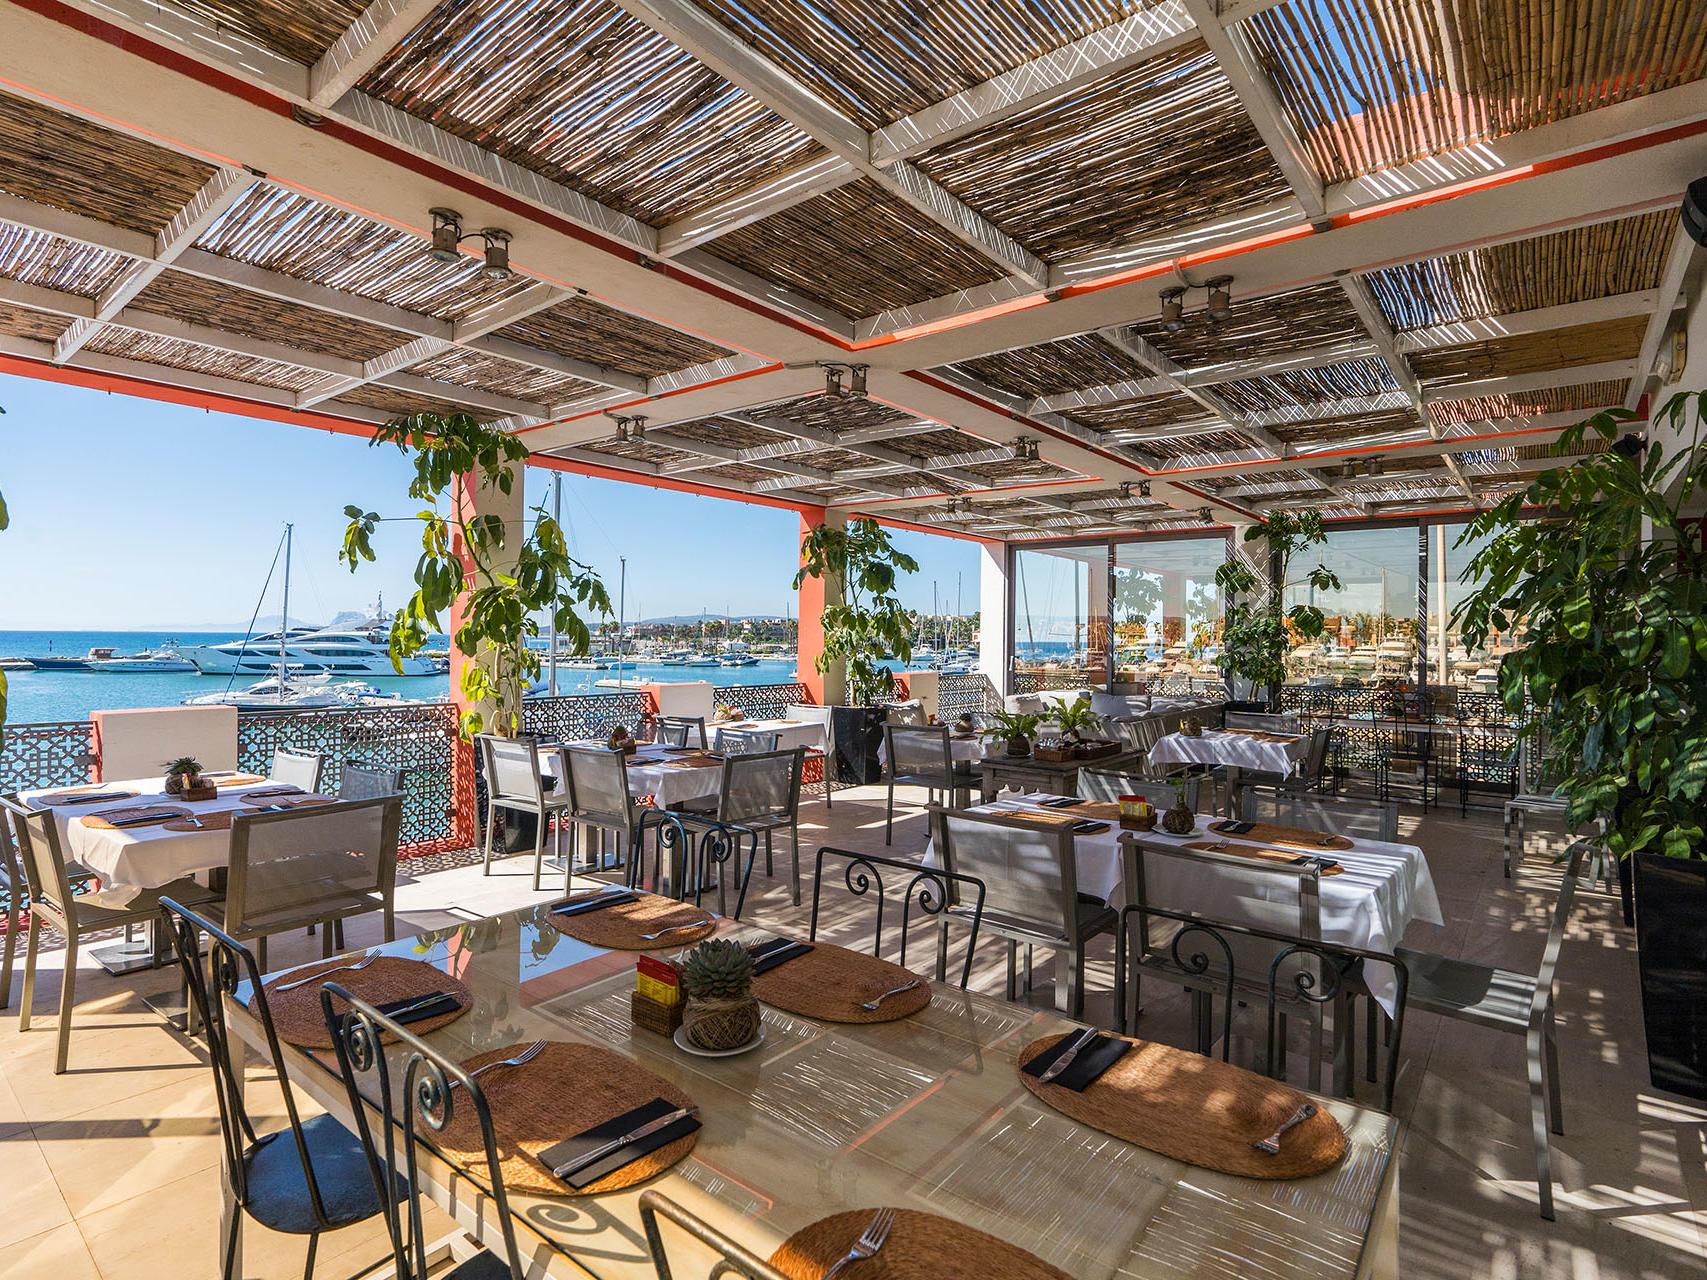 El Maritimo terrace restaurant at Hotel Club Maritimo de Sotogrande, Cádiz, Spain